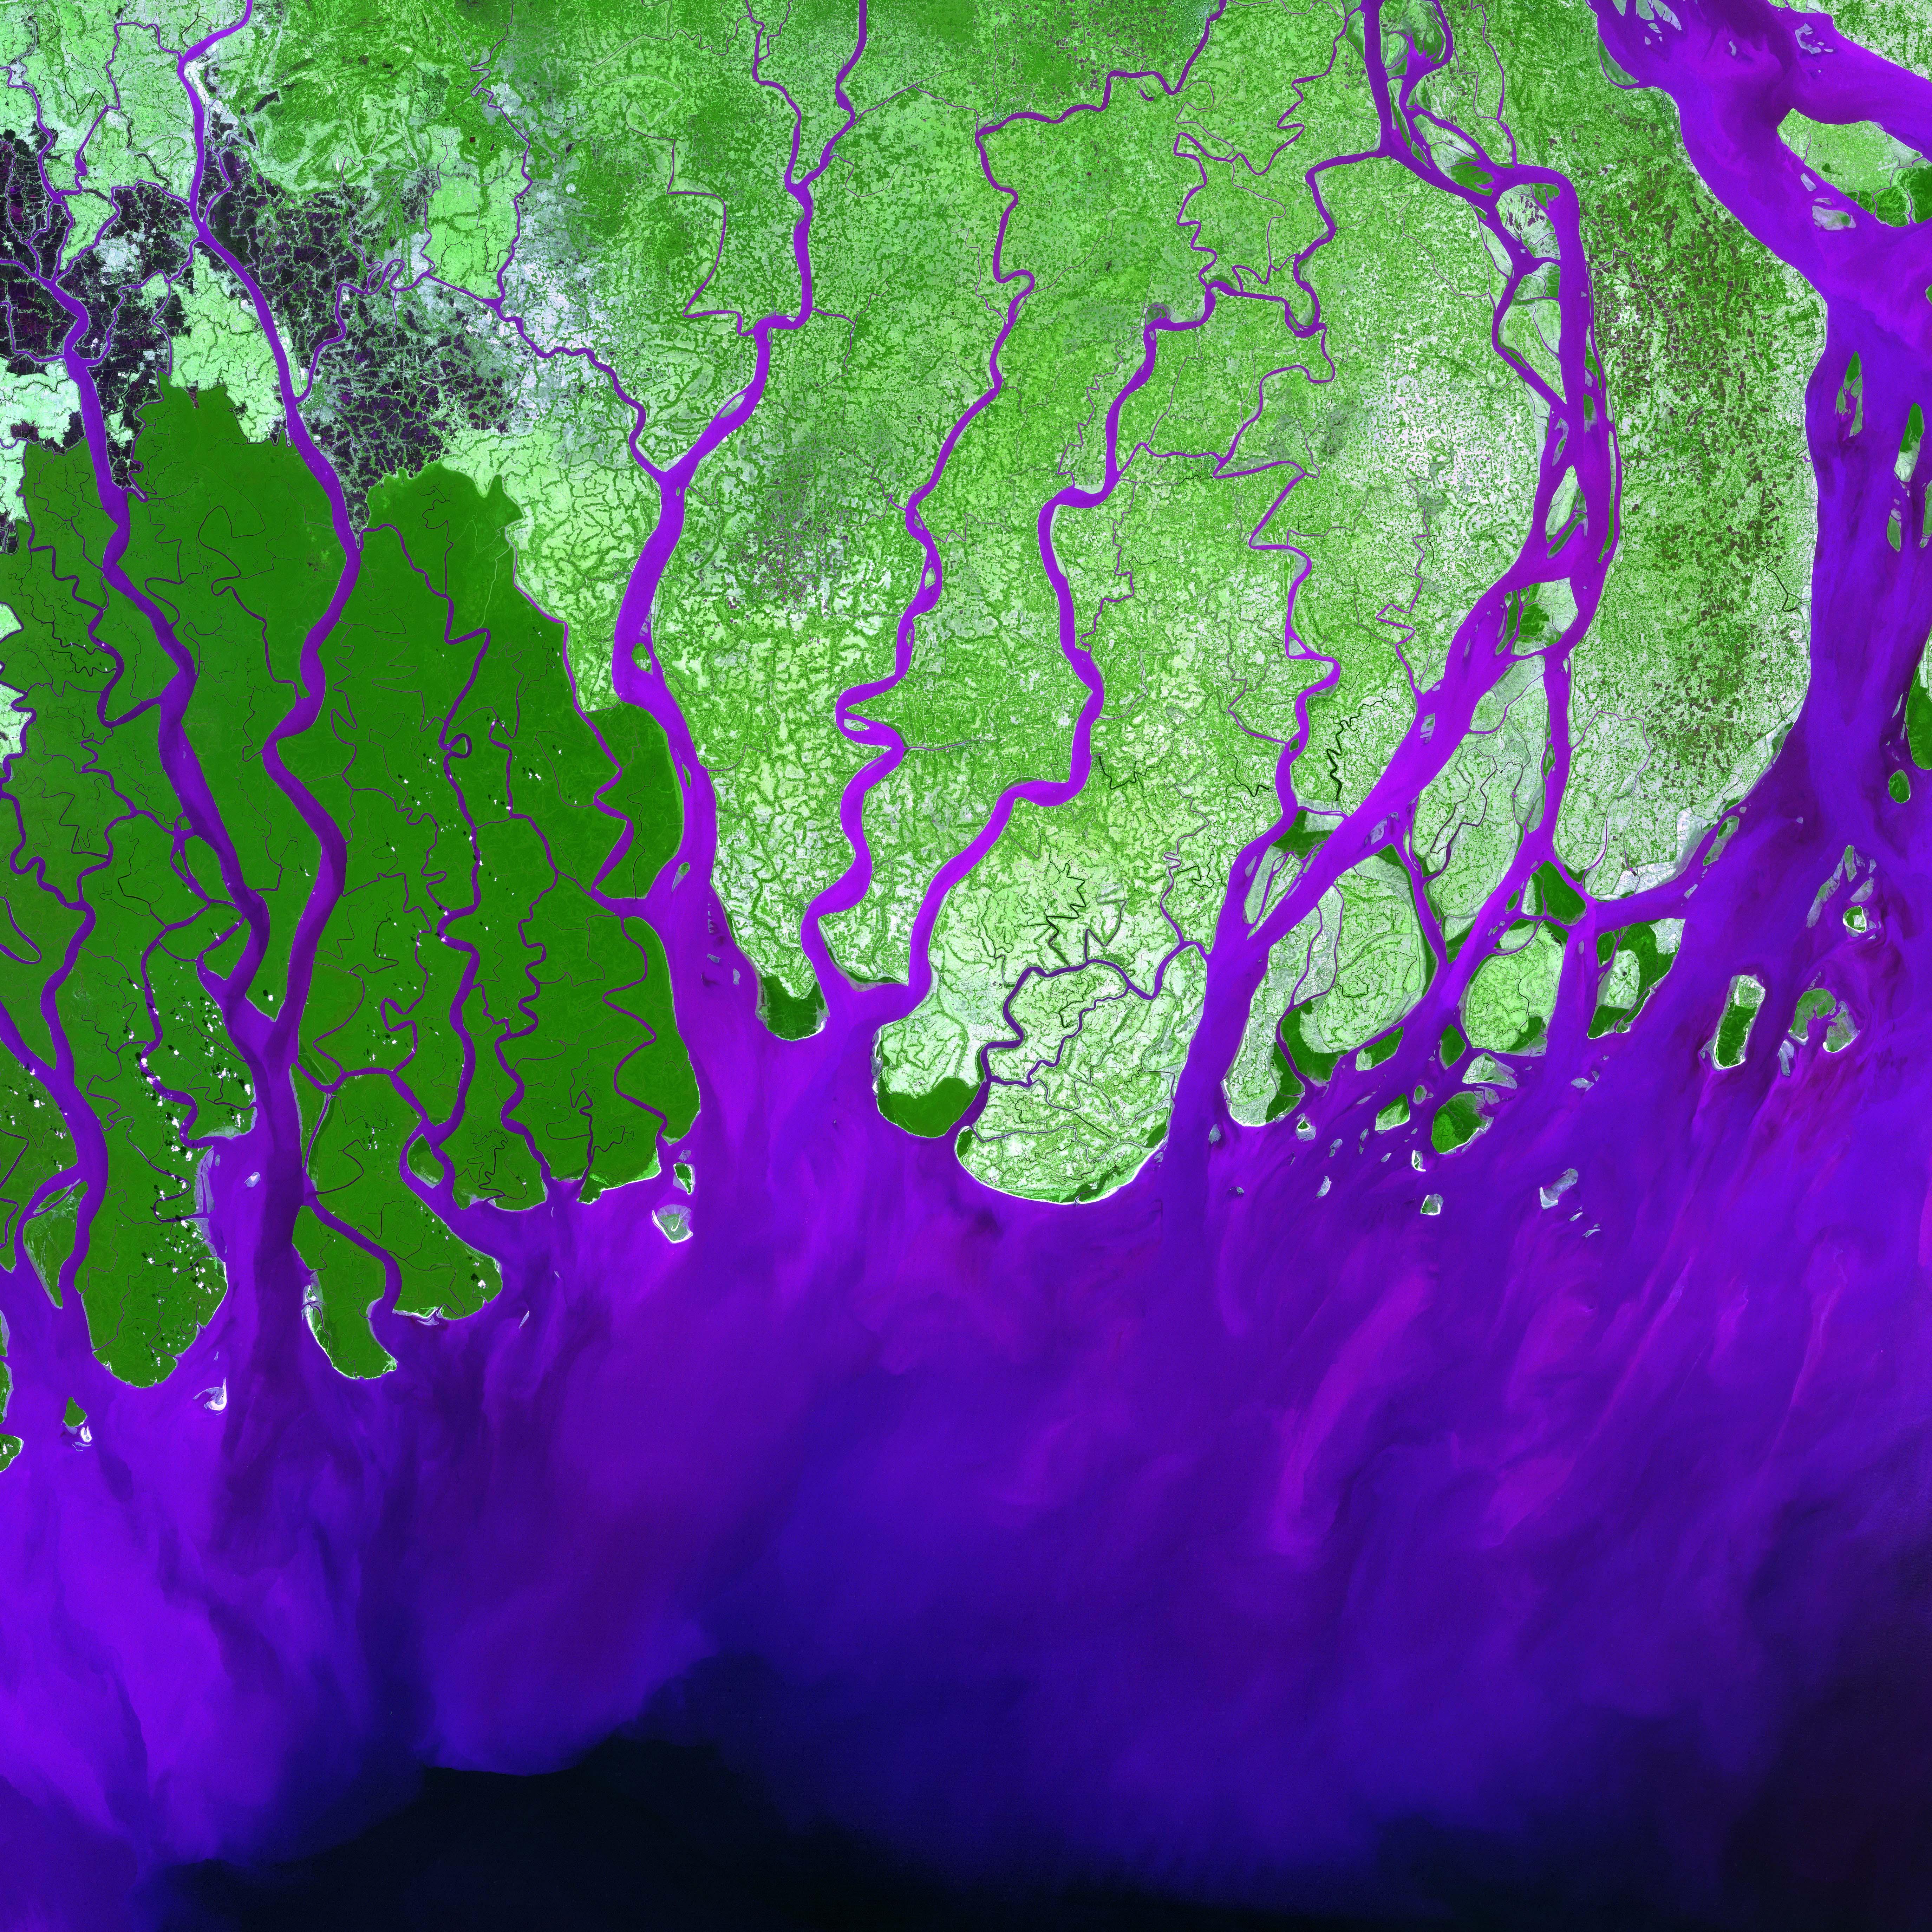 Maps of Ganges River Delta - mapa.owje.com Ganges River Map on tigris river map, godavari river, brahmaputra river map, river thames, godavari river map, indian ocean, indus river, deccan plateau map, taj mahal, euphrates river map, great indian desert map, arabian sea map, bay of bengal, yangtze river, great lakes map, india map, yellow river, mississippi river, brahmaputra river, persian gulf map, irrawaddy river map, china map, krishna river map, rhine river map, narmada river, niger river map, amazon river map, yangtze river map, bay of bengal map, new delhi, mekong river map,